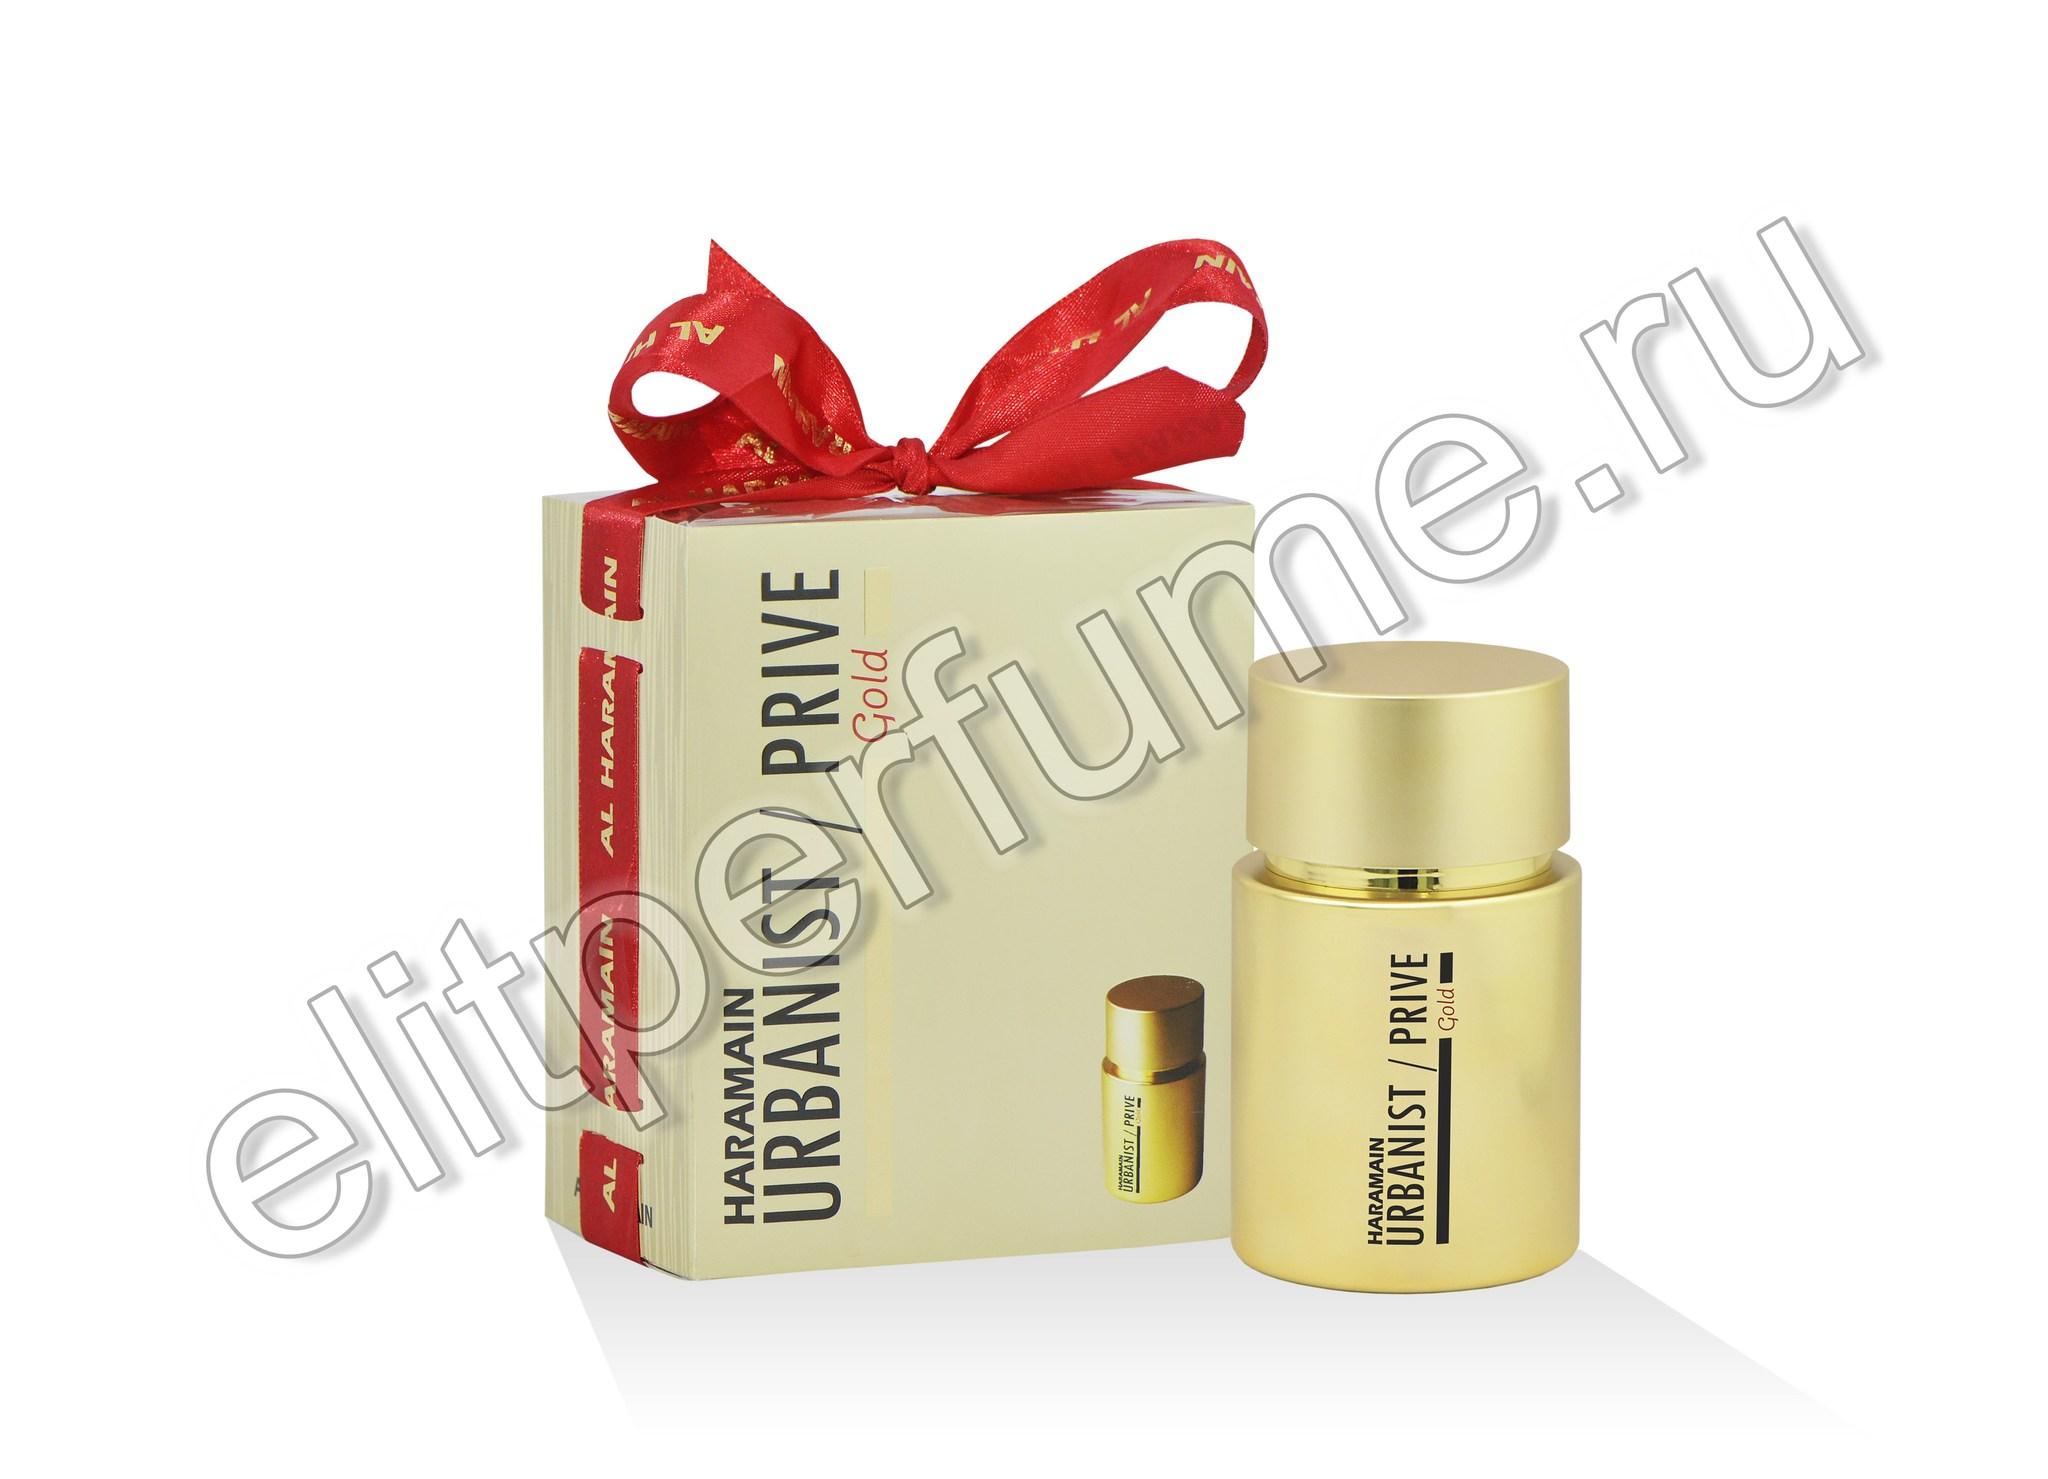 Haramain Urbanist Prive Gold / Харамайн Урбанист Элит-Золотой 100 мл спрей от Аль Харамайн Al Haramain Perfumes